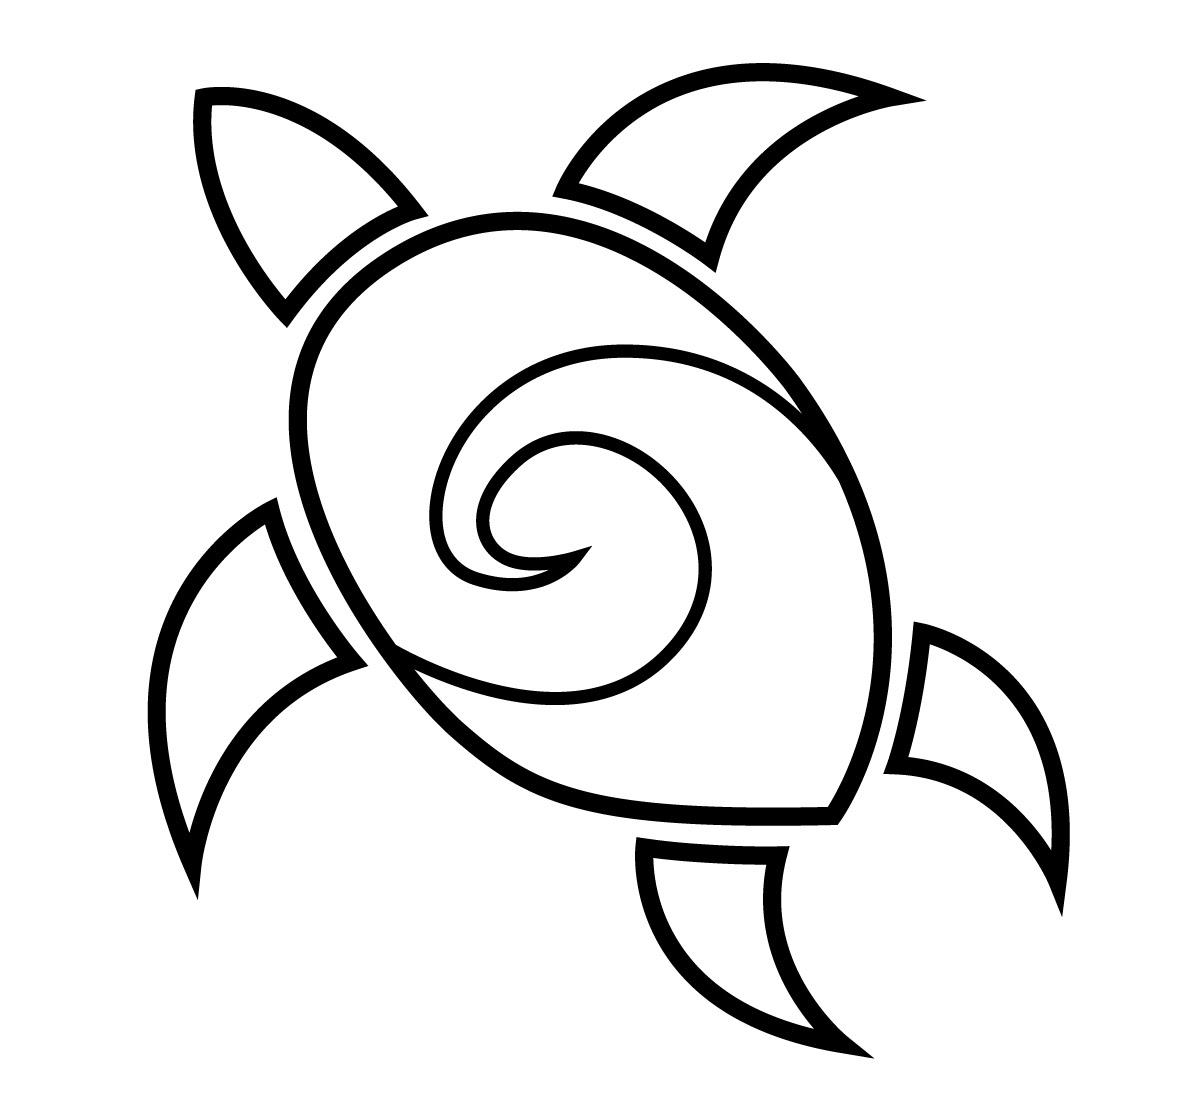 Easy Draw Tattoos Designs Tattoos Designs Ideas